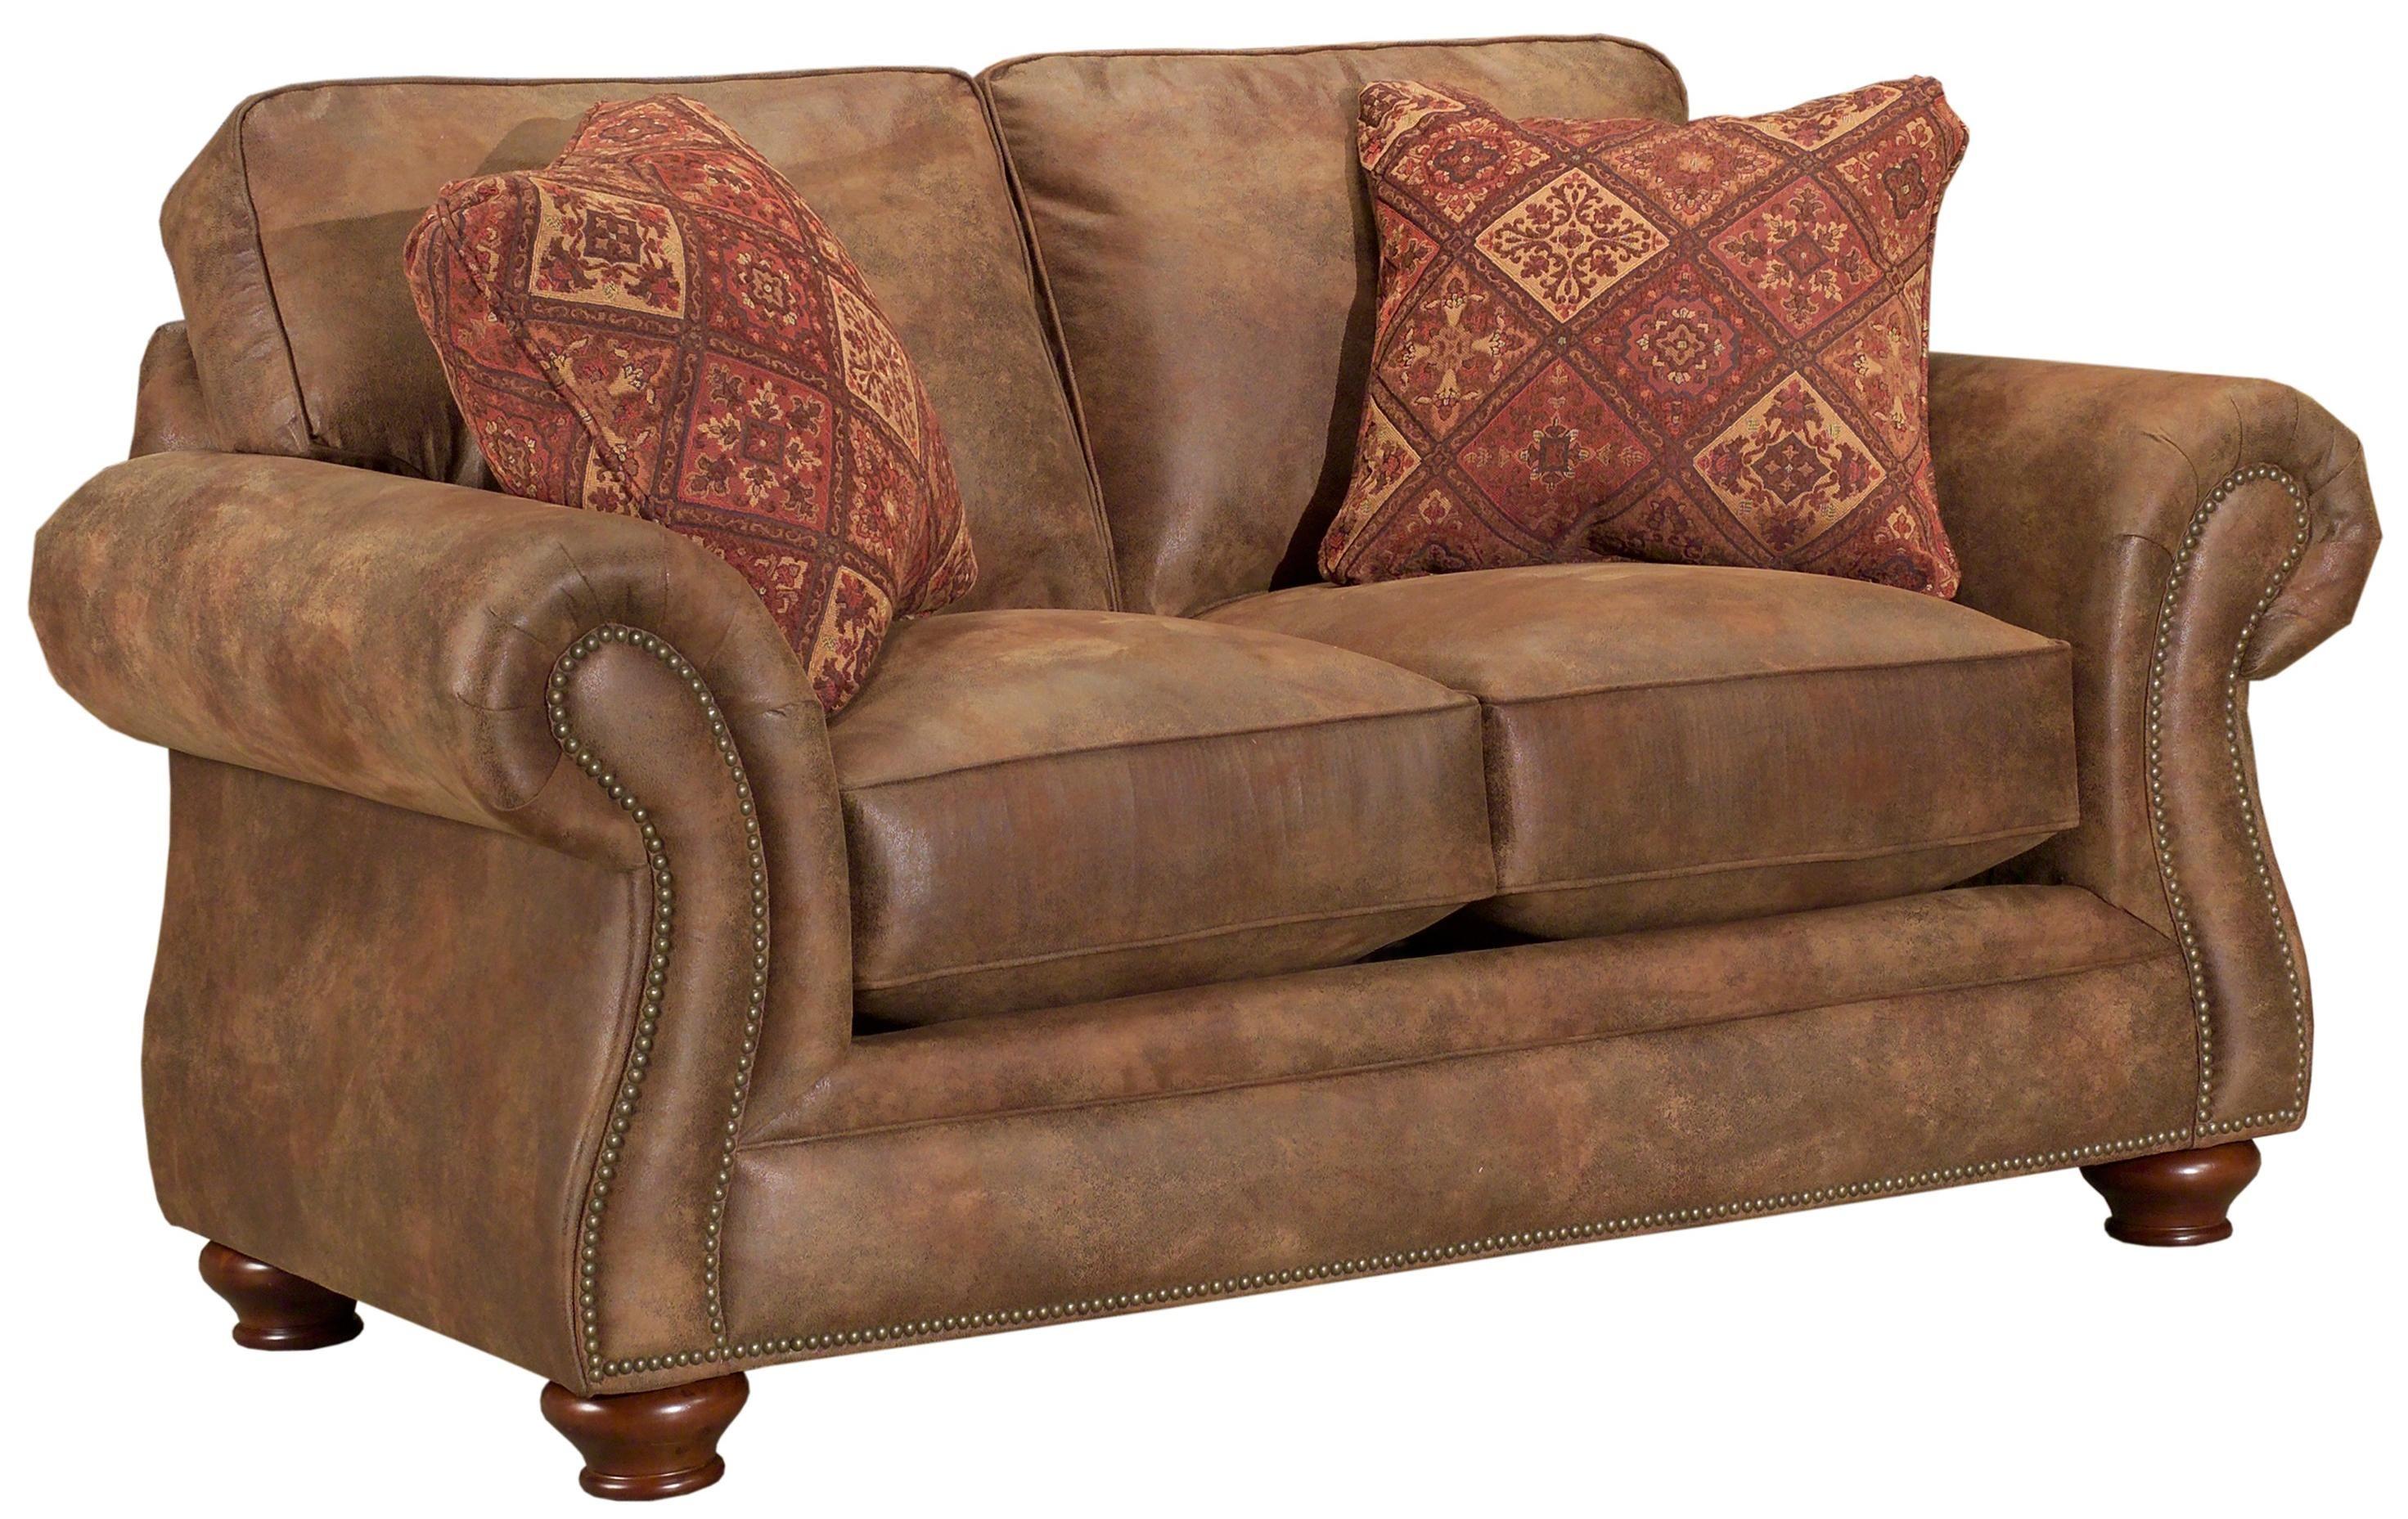 broyhill sofa nebraska furniture mart sets cheap 5081 laramie loveseat by